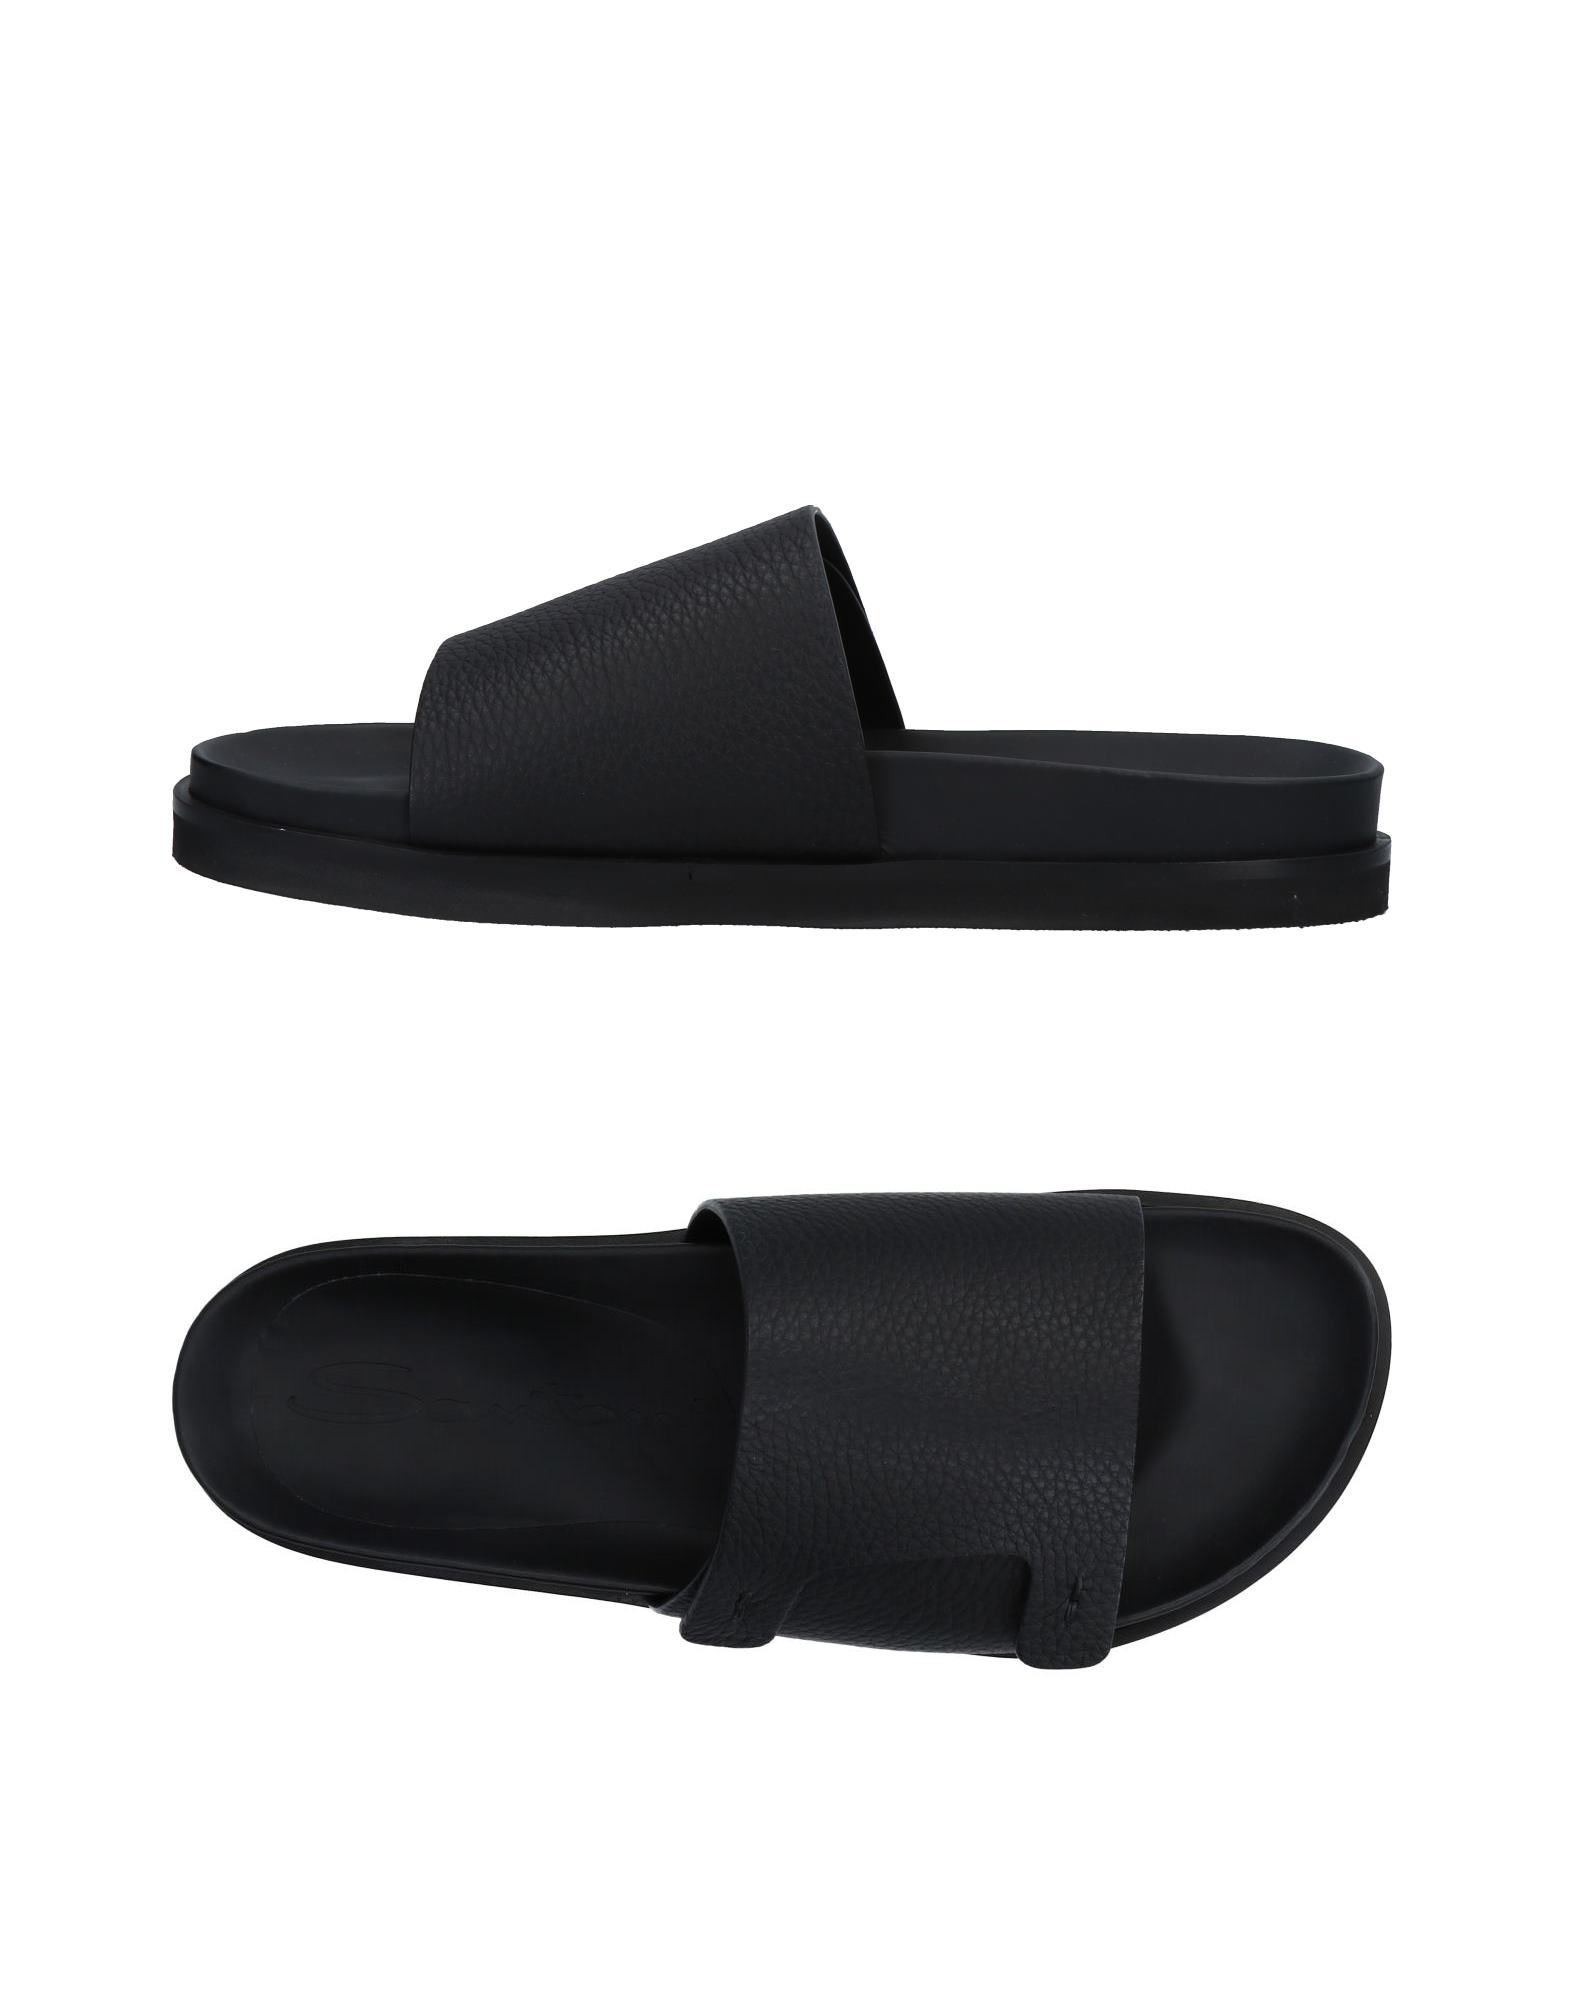 Santoni Sandalen Gute Herren  11482170SA Gute Sandalen Qualität beliebte Schuhe 9db44e